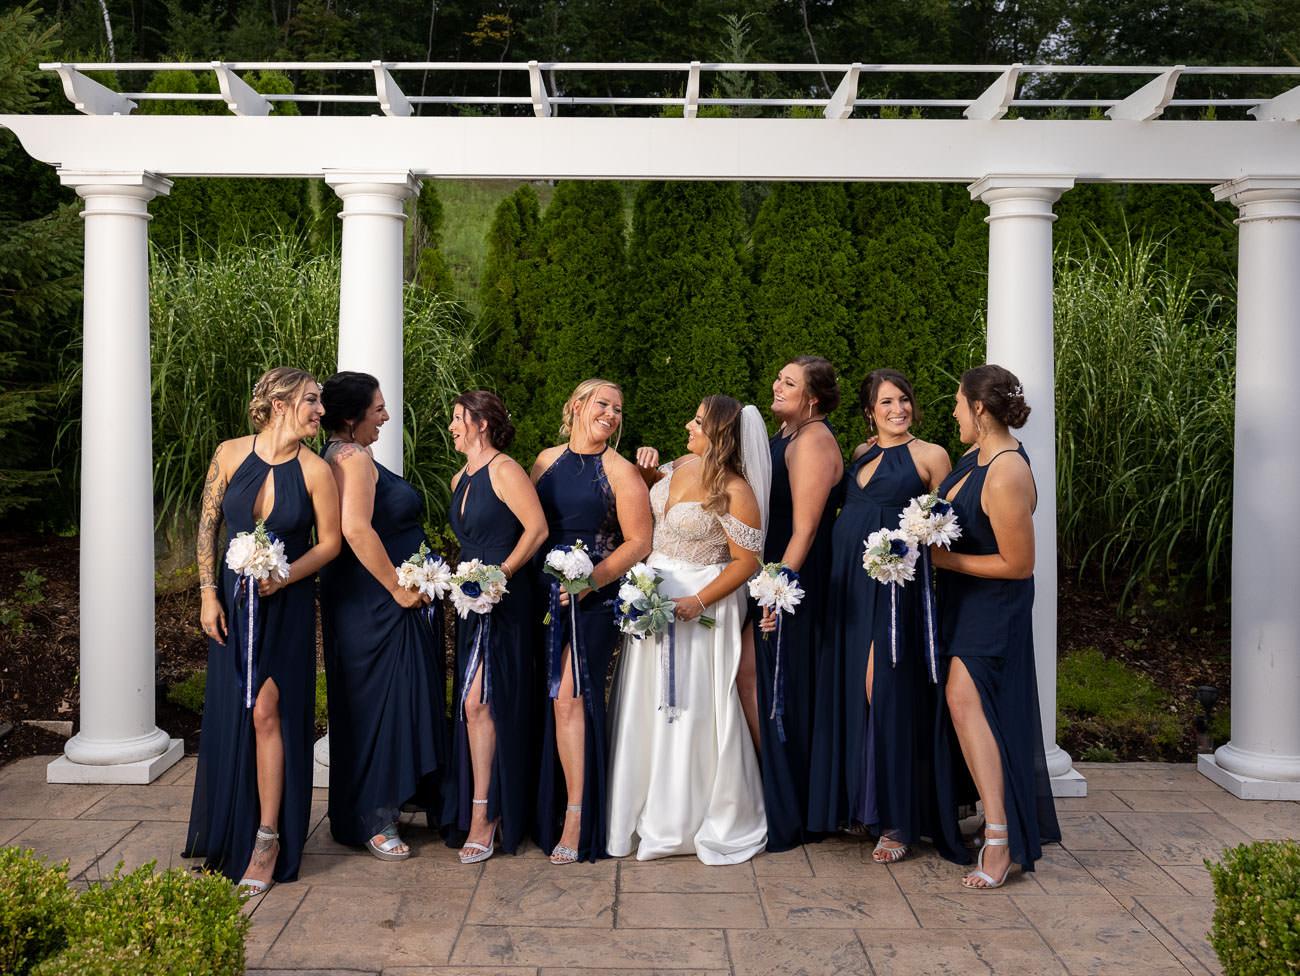 Aria wedding photography